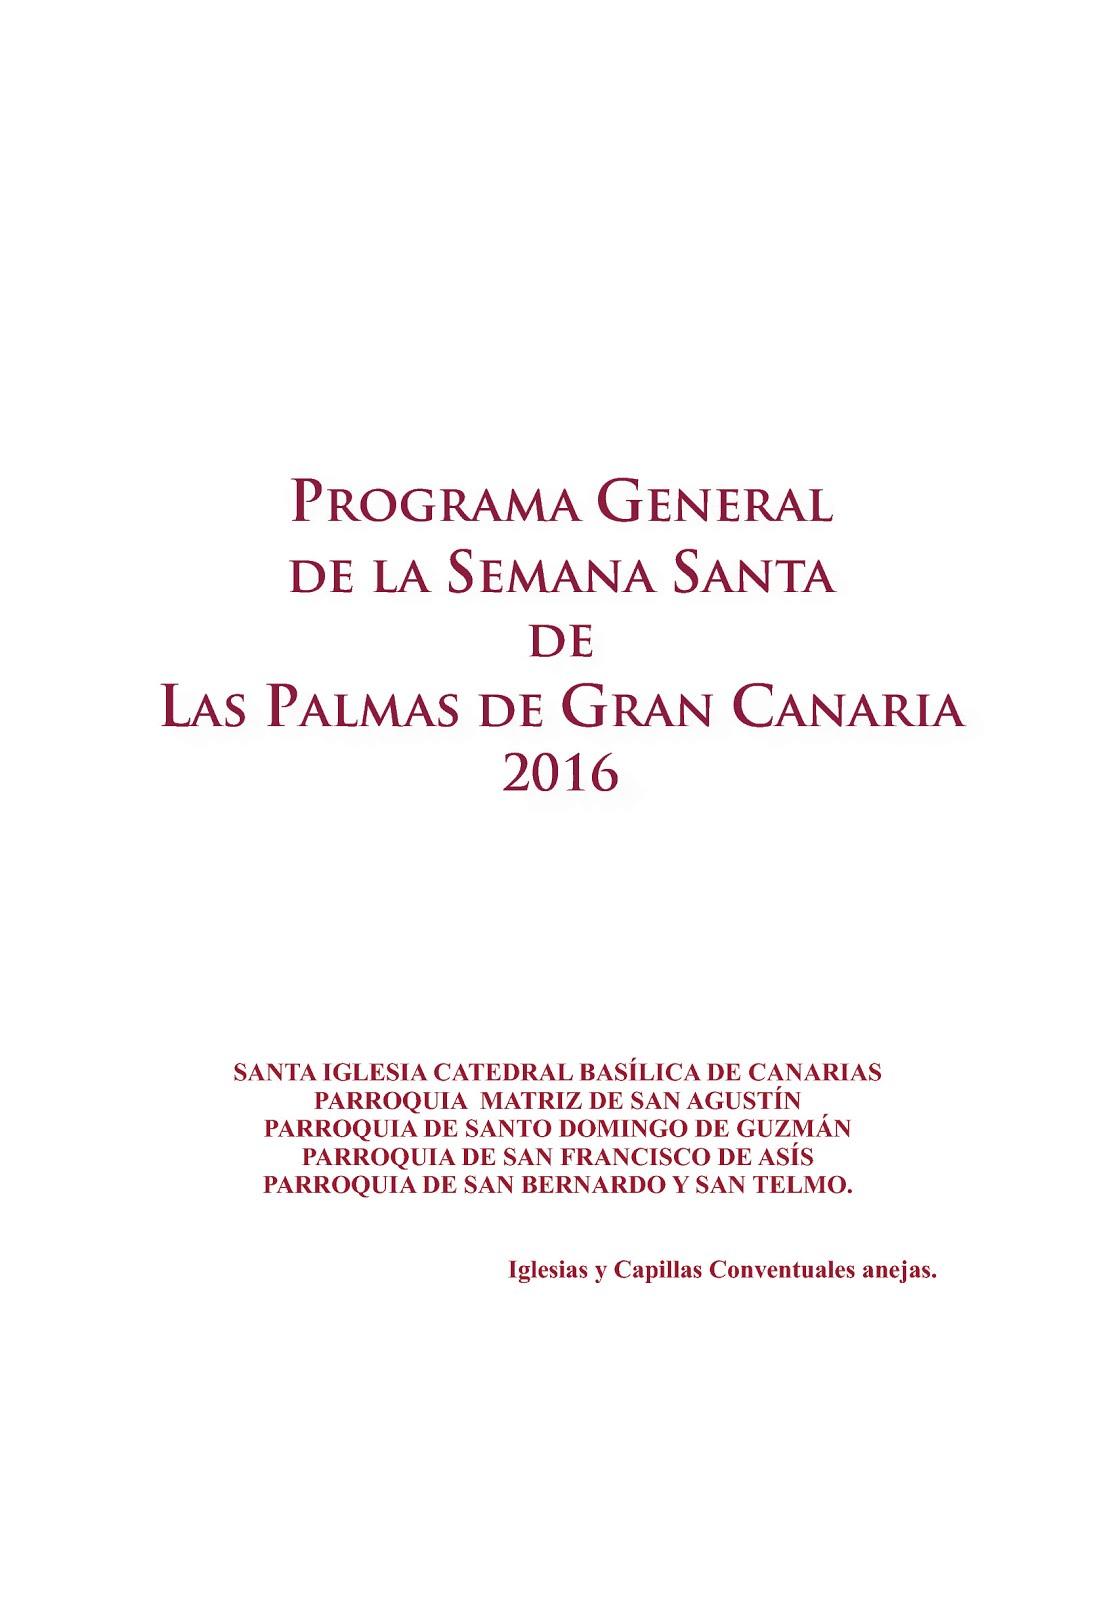 PROGRAMA SEMANA SANTA 2016